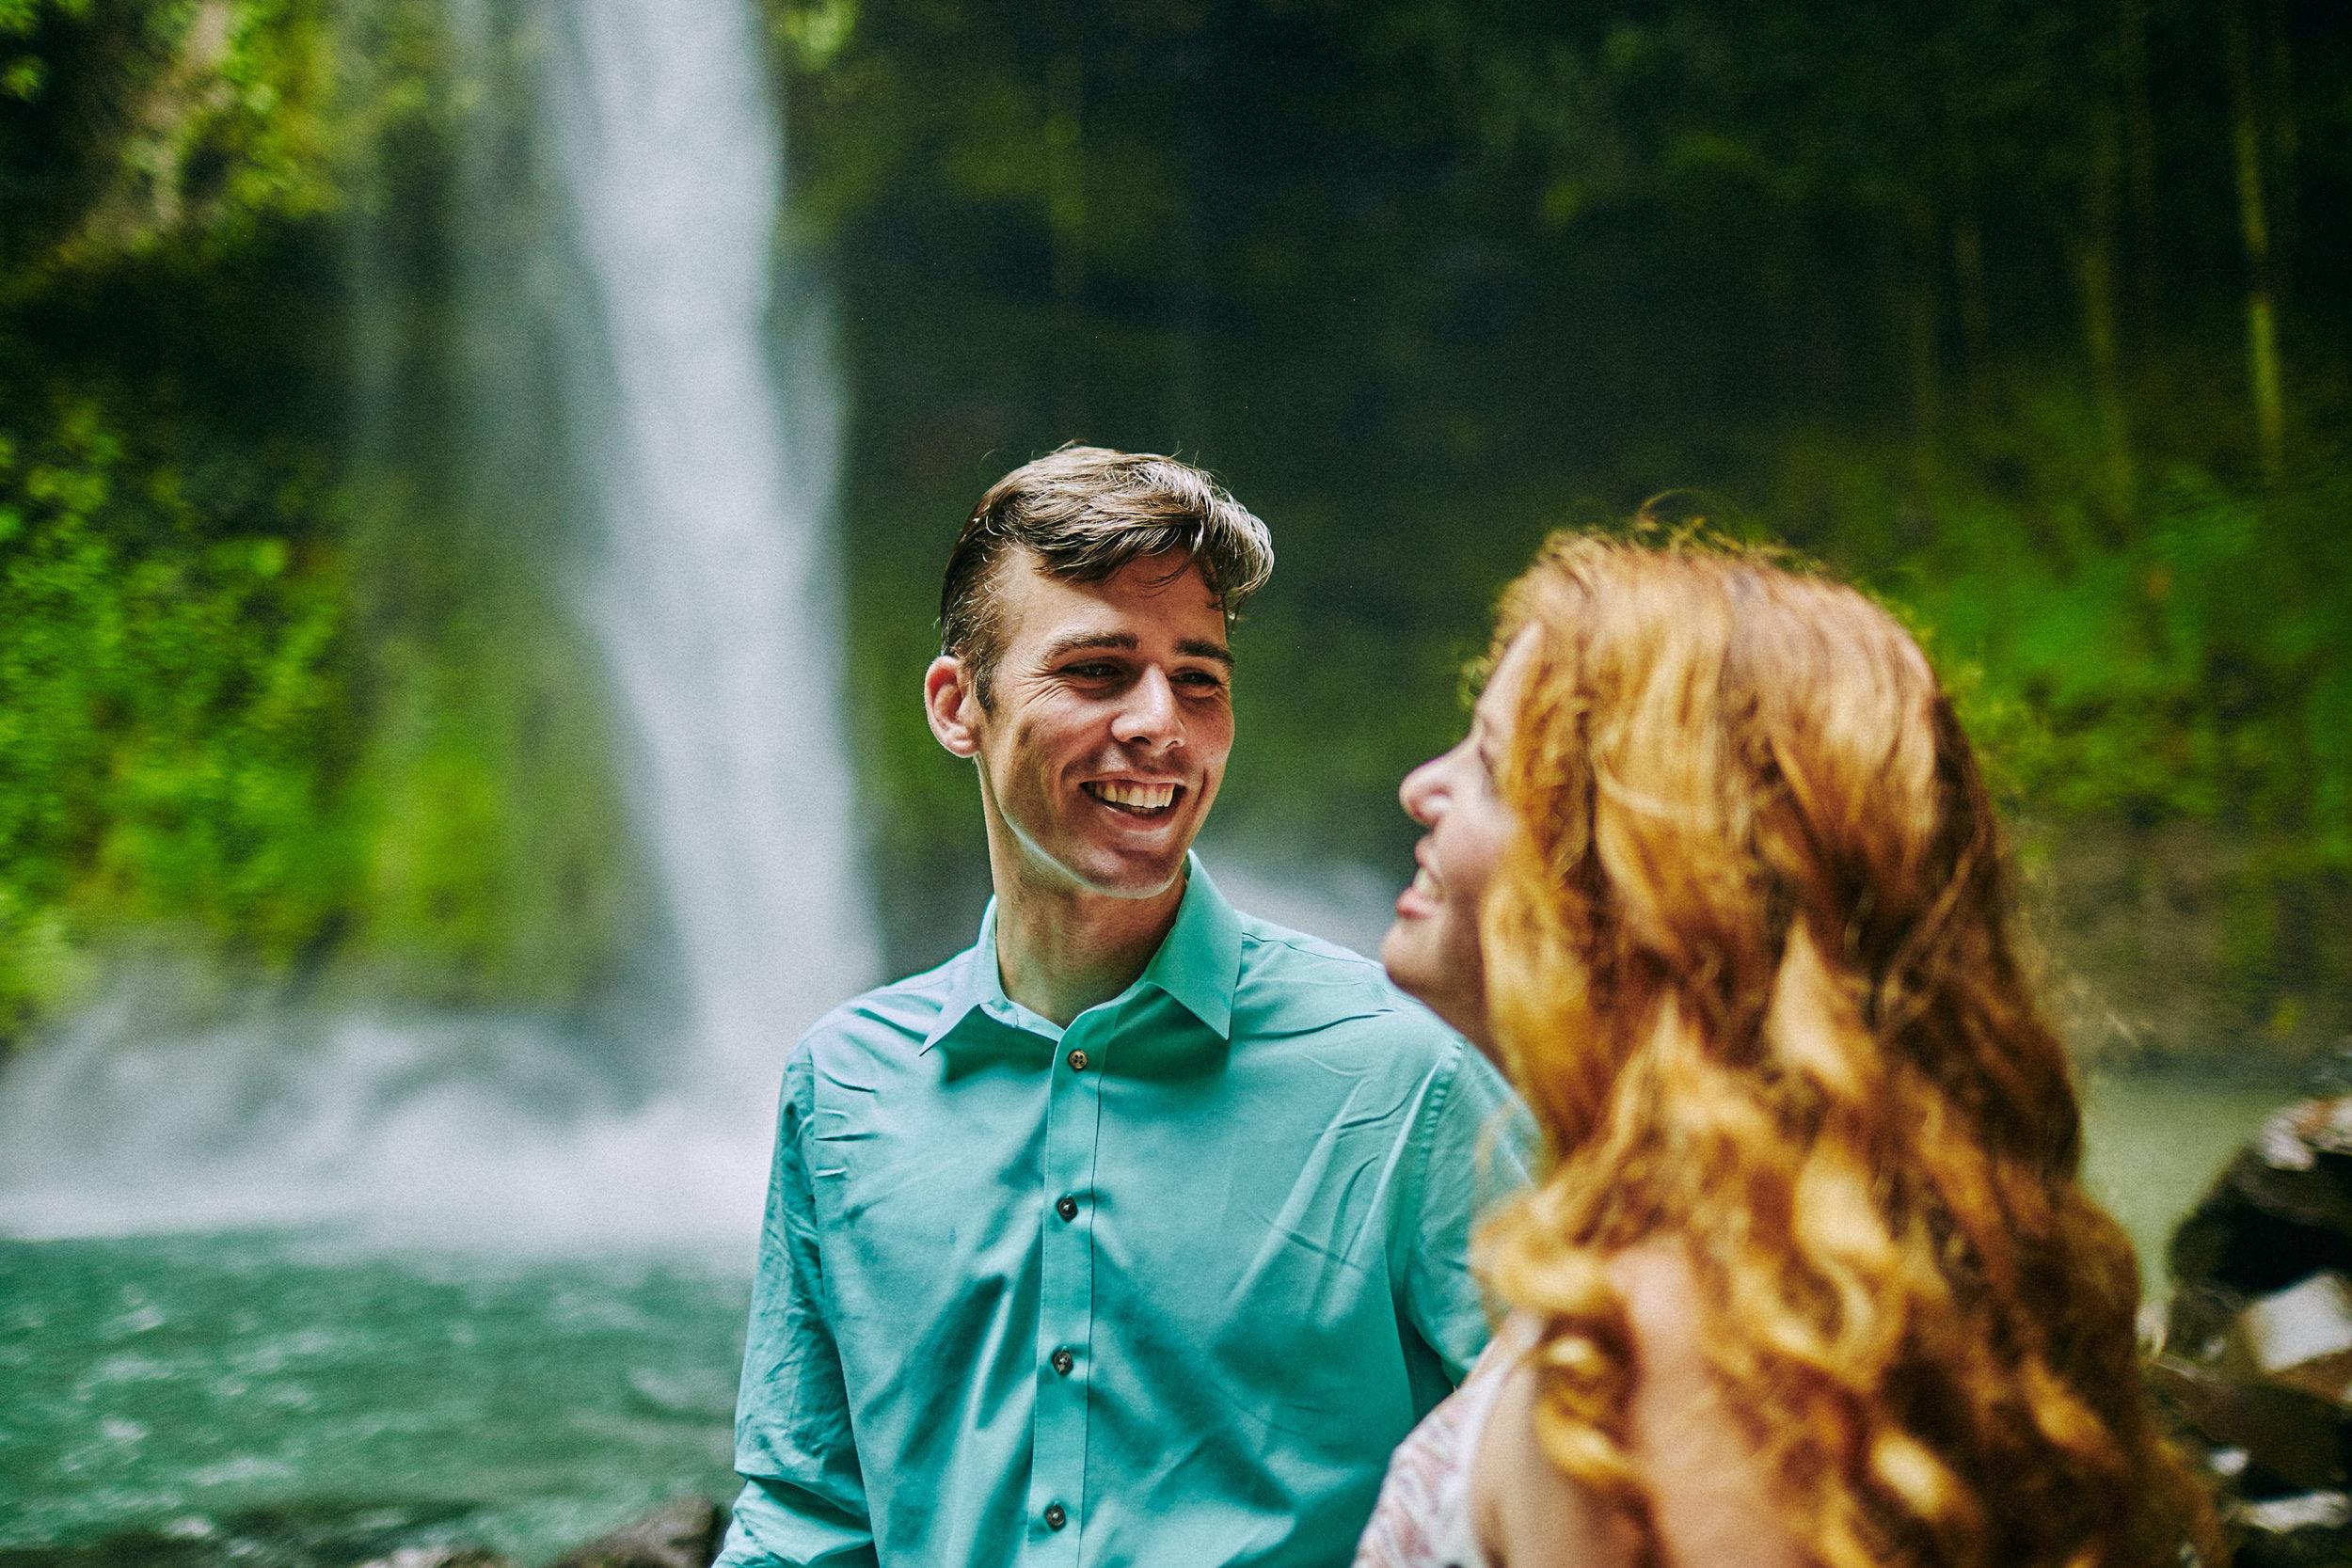 Engagement_La_Fortuna_Waterfall 02.jpg